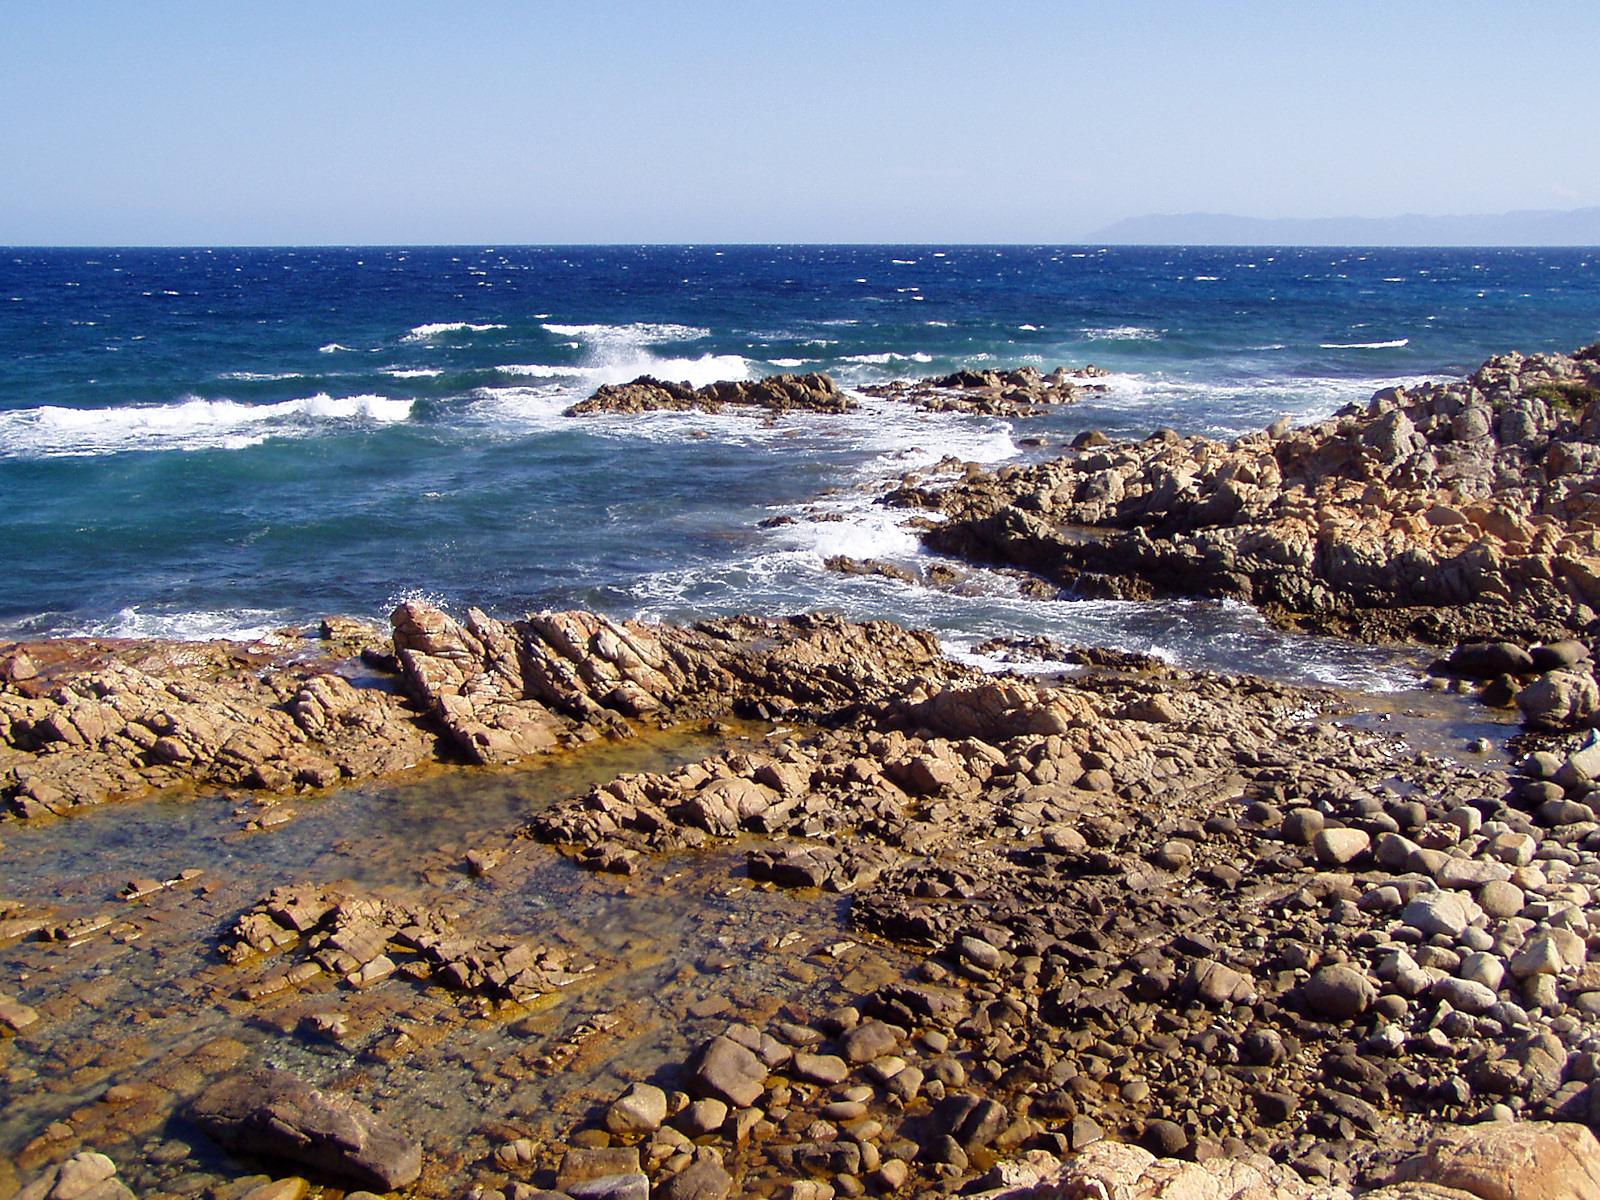 Orosei Italy  city pictures gallery : Cala Liberotto coast, Orosei, Sardinia, Italy Wikipedia ...